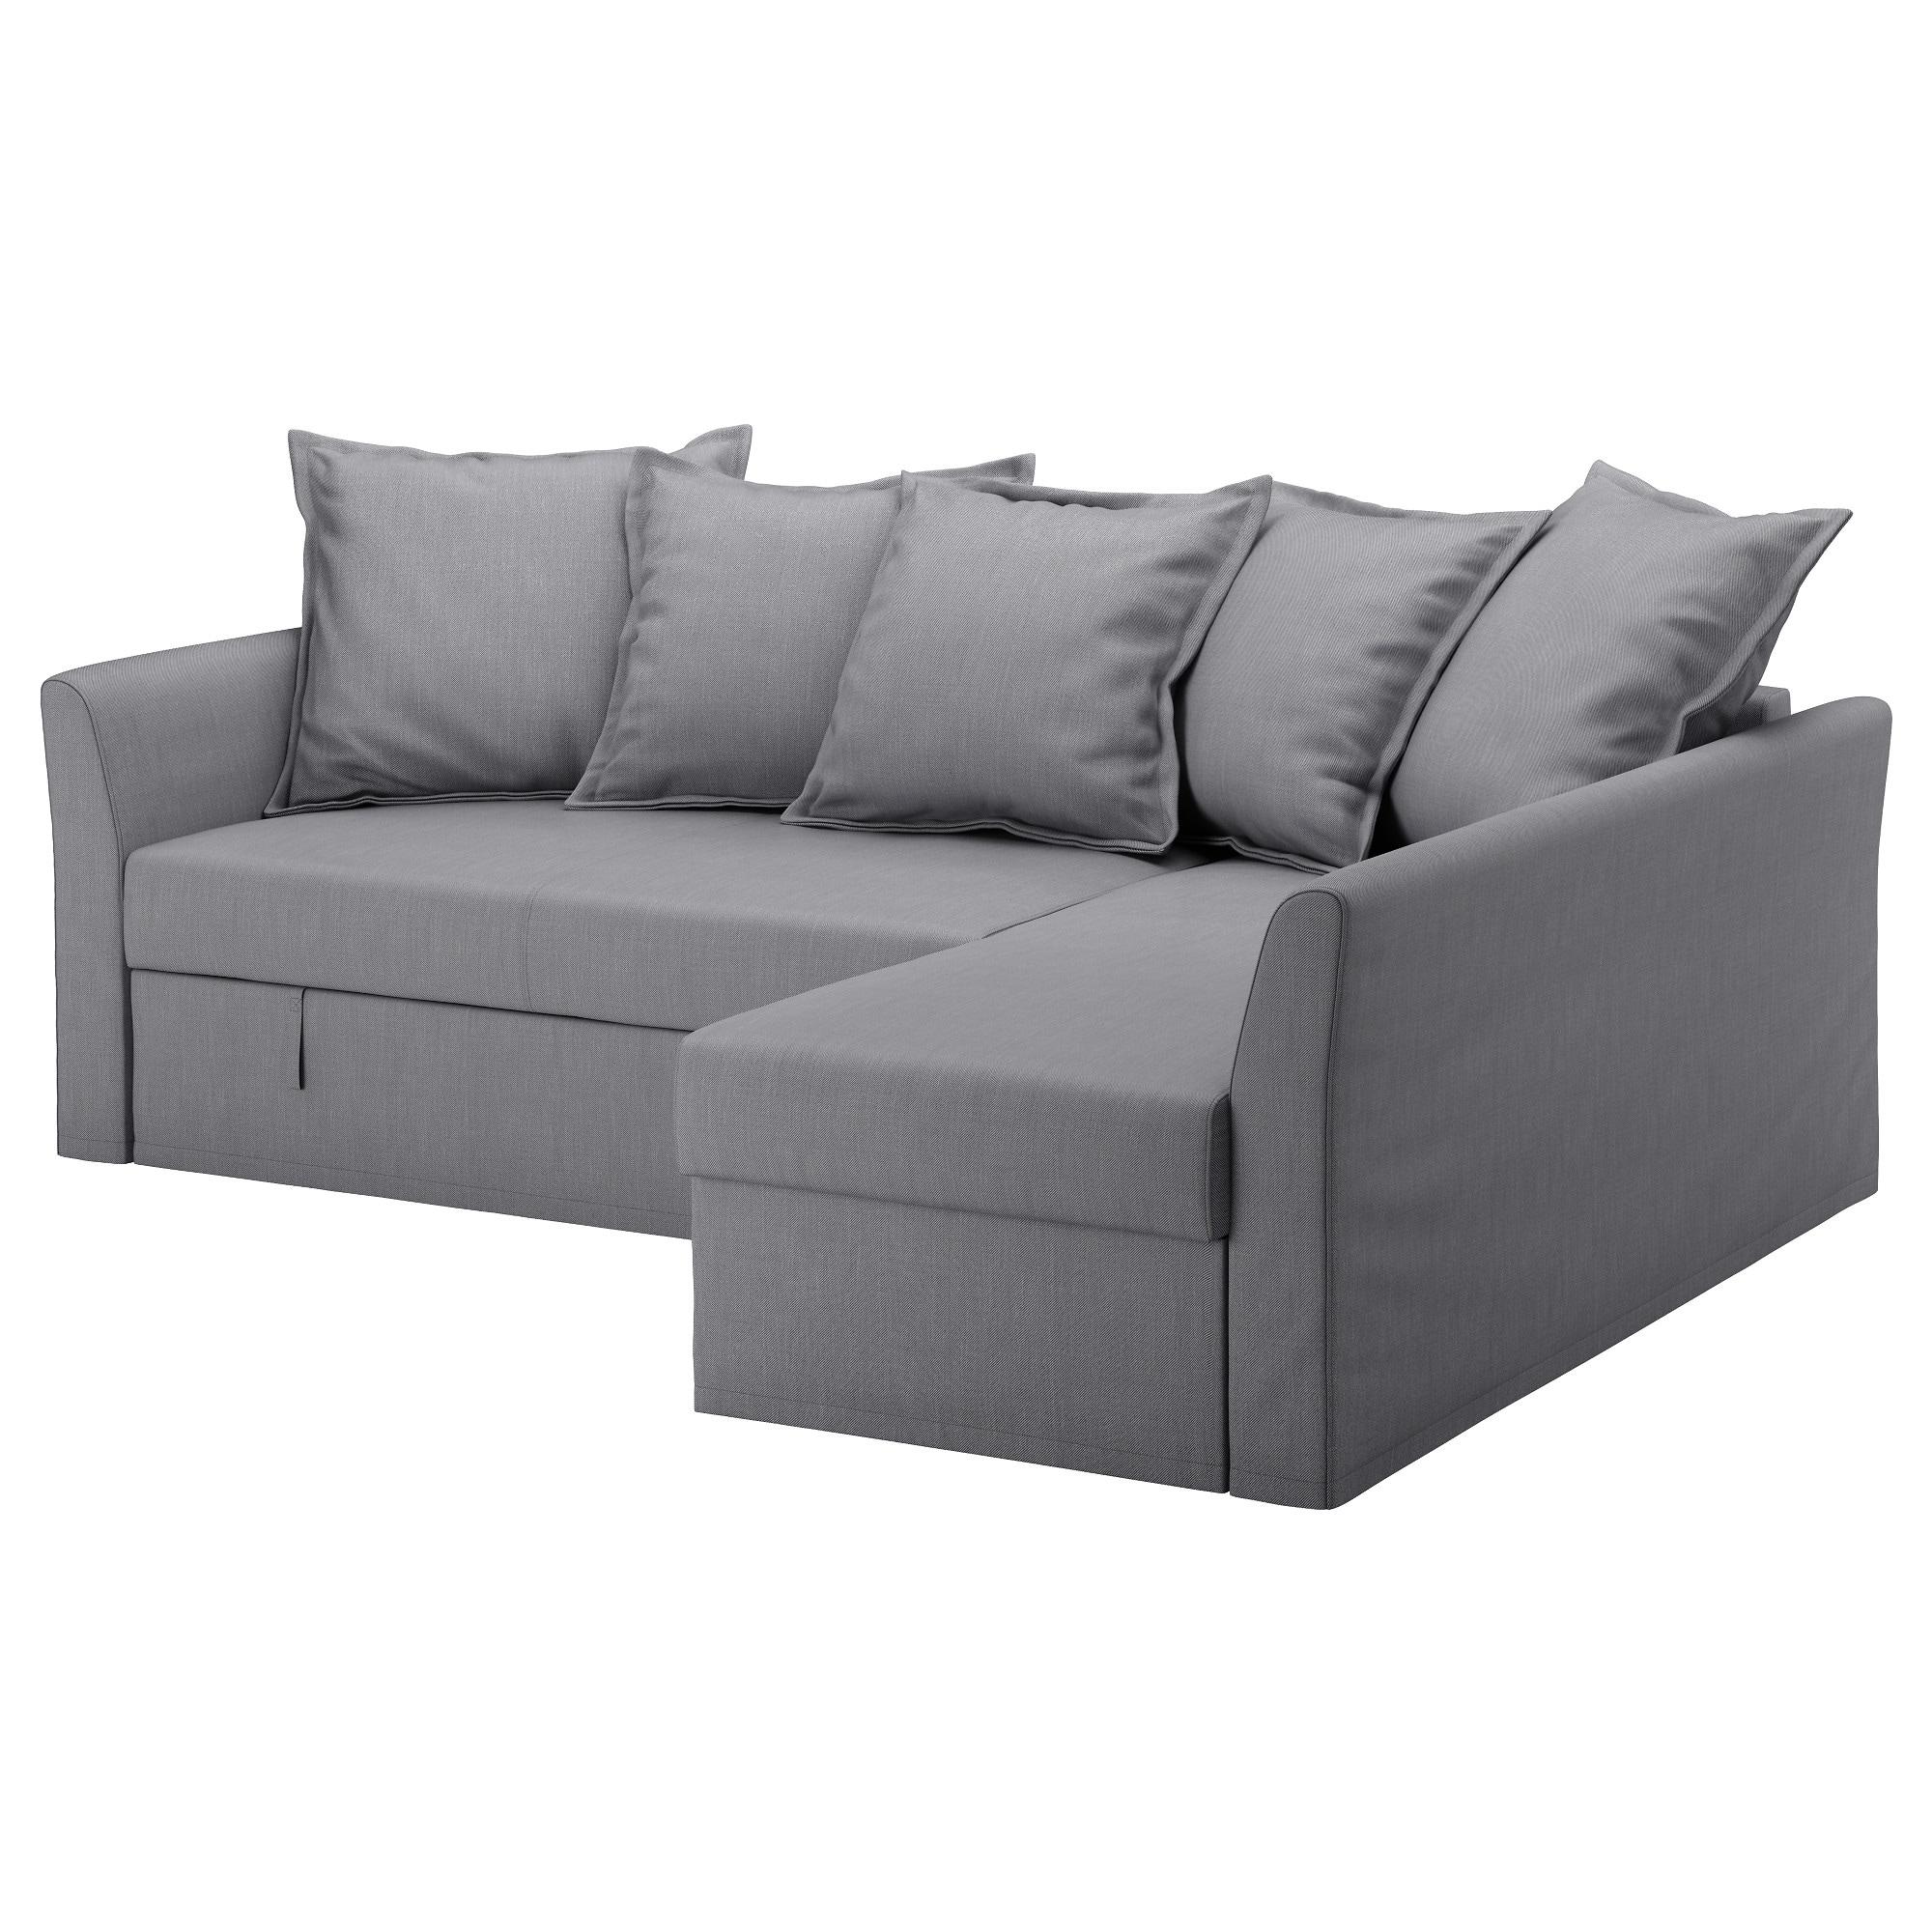 Holmsund Corner Sofa Bed Nordvalla Medium Grey – Ikea With Regard To Ikea Sofa Chairs (Image 10 of 25)